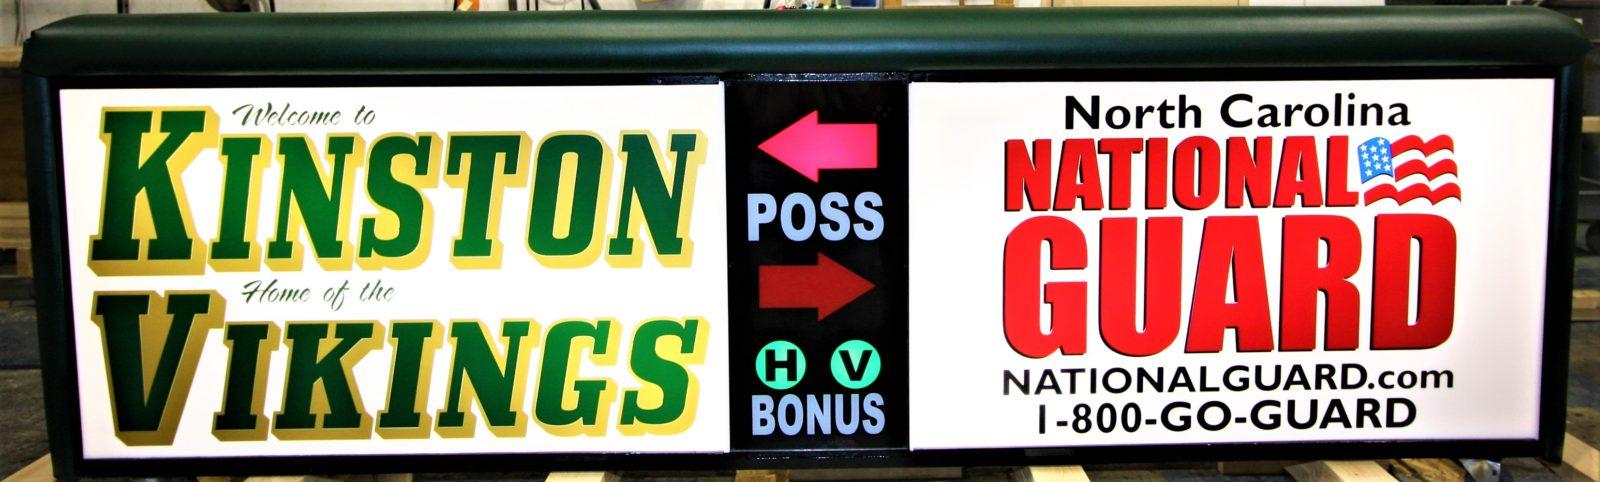 Kinston high school scoring table North Carolina National Guard NCARNG